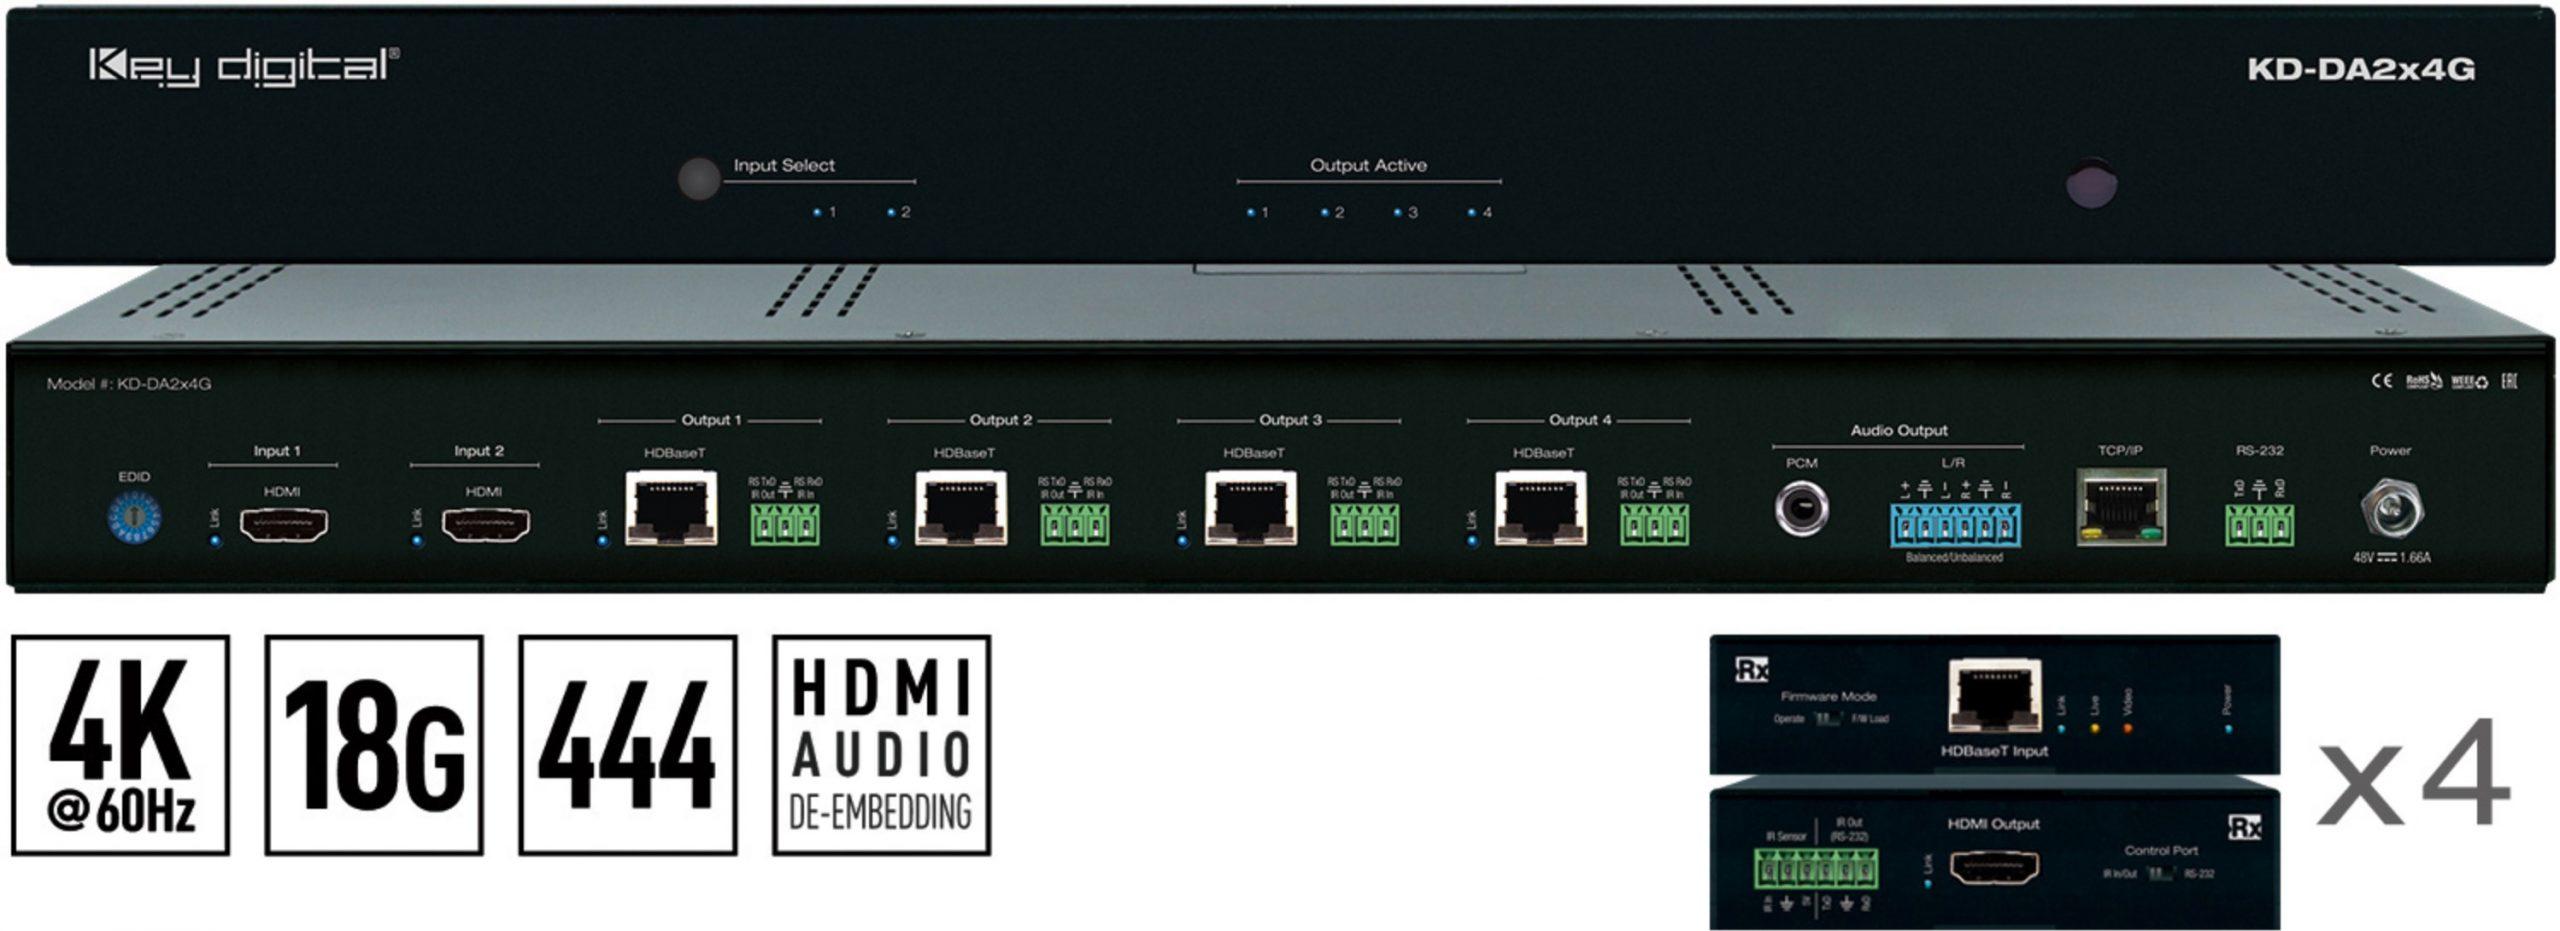 Key Digital Highlights HDMI Distribution System For Digital Signage